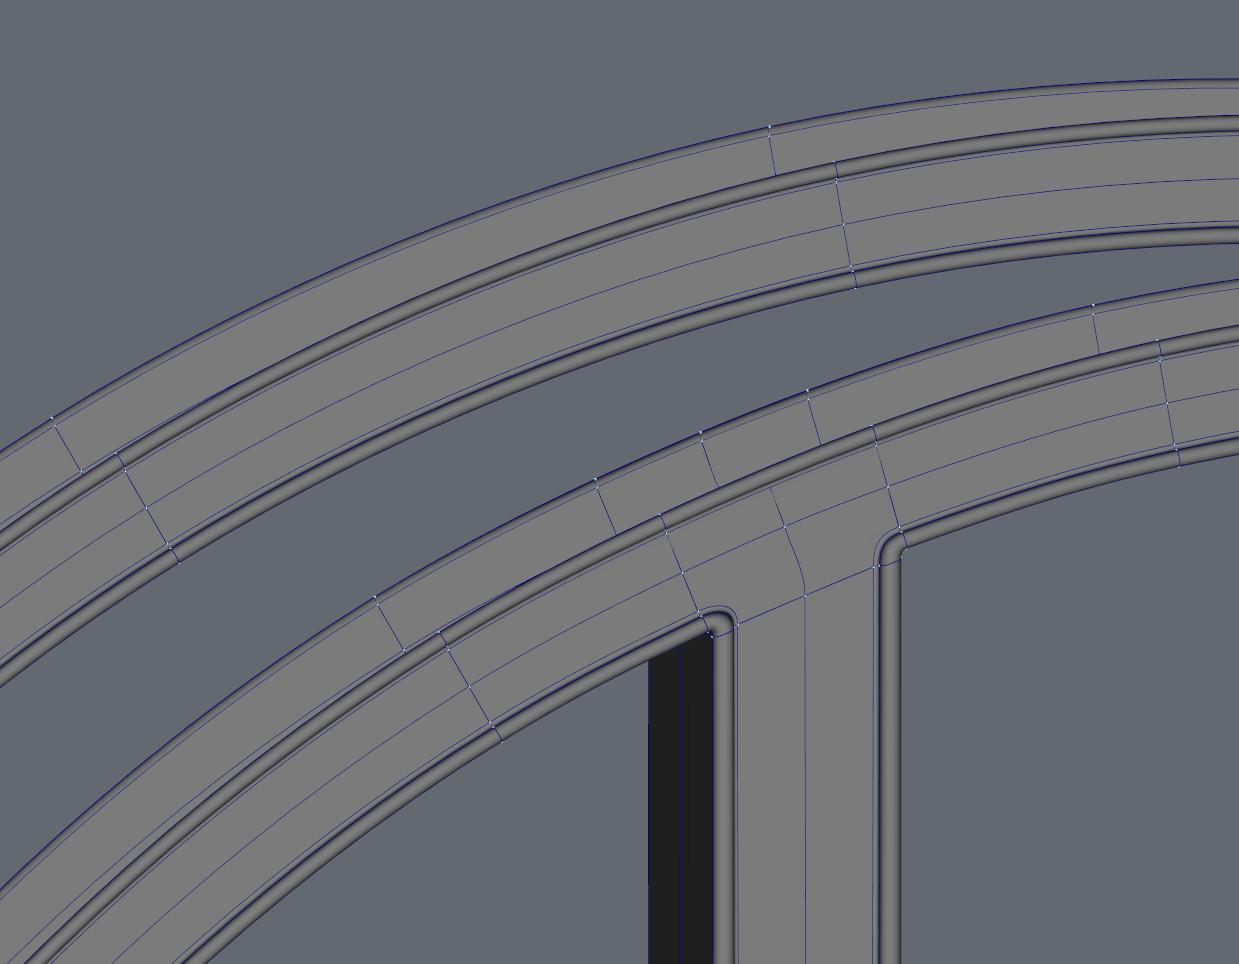 arch_with_column.jpg